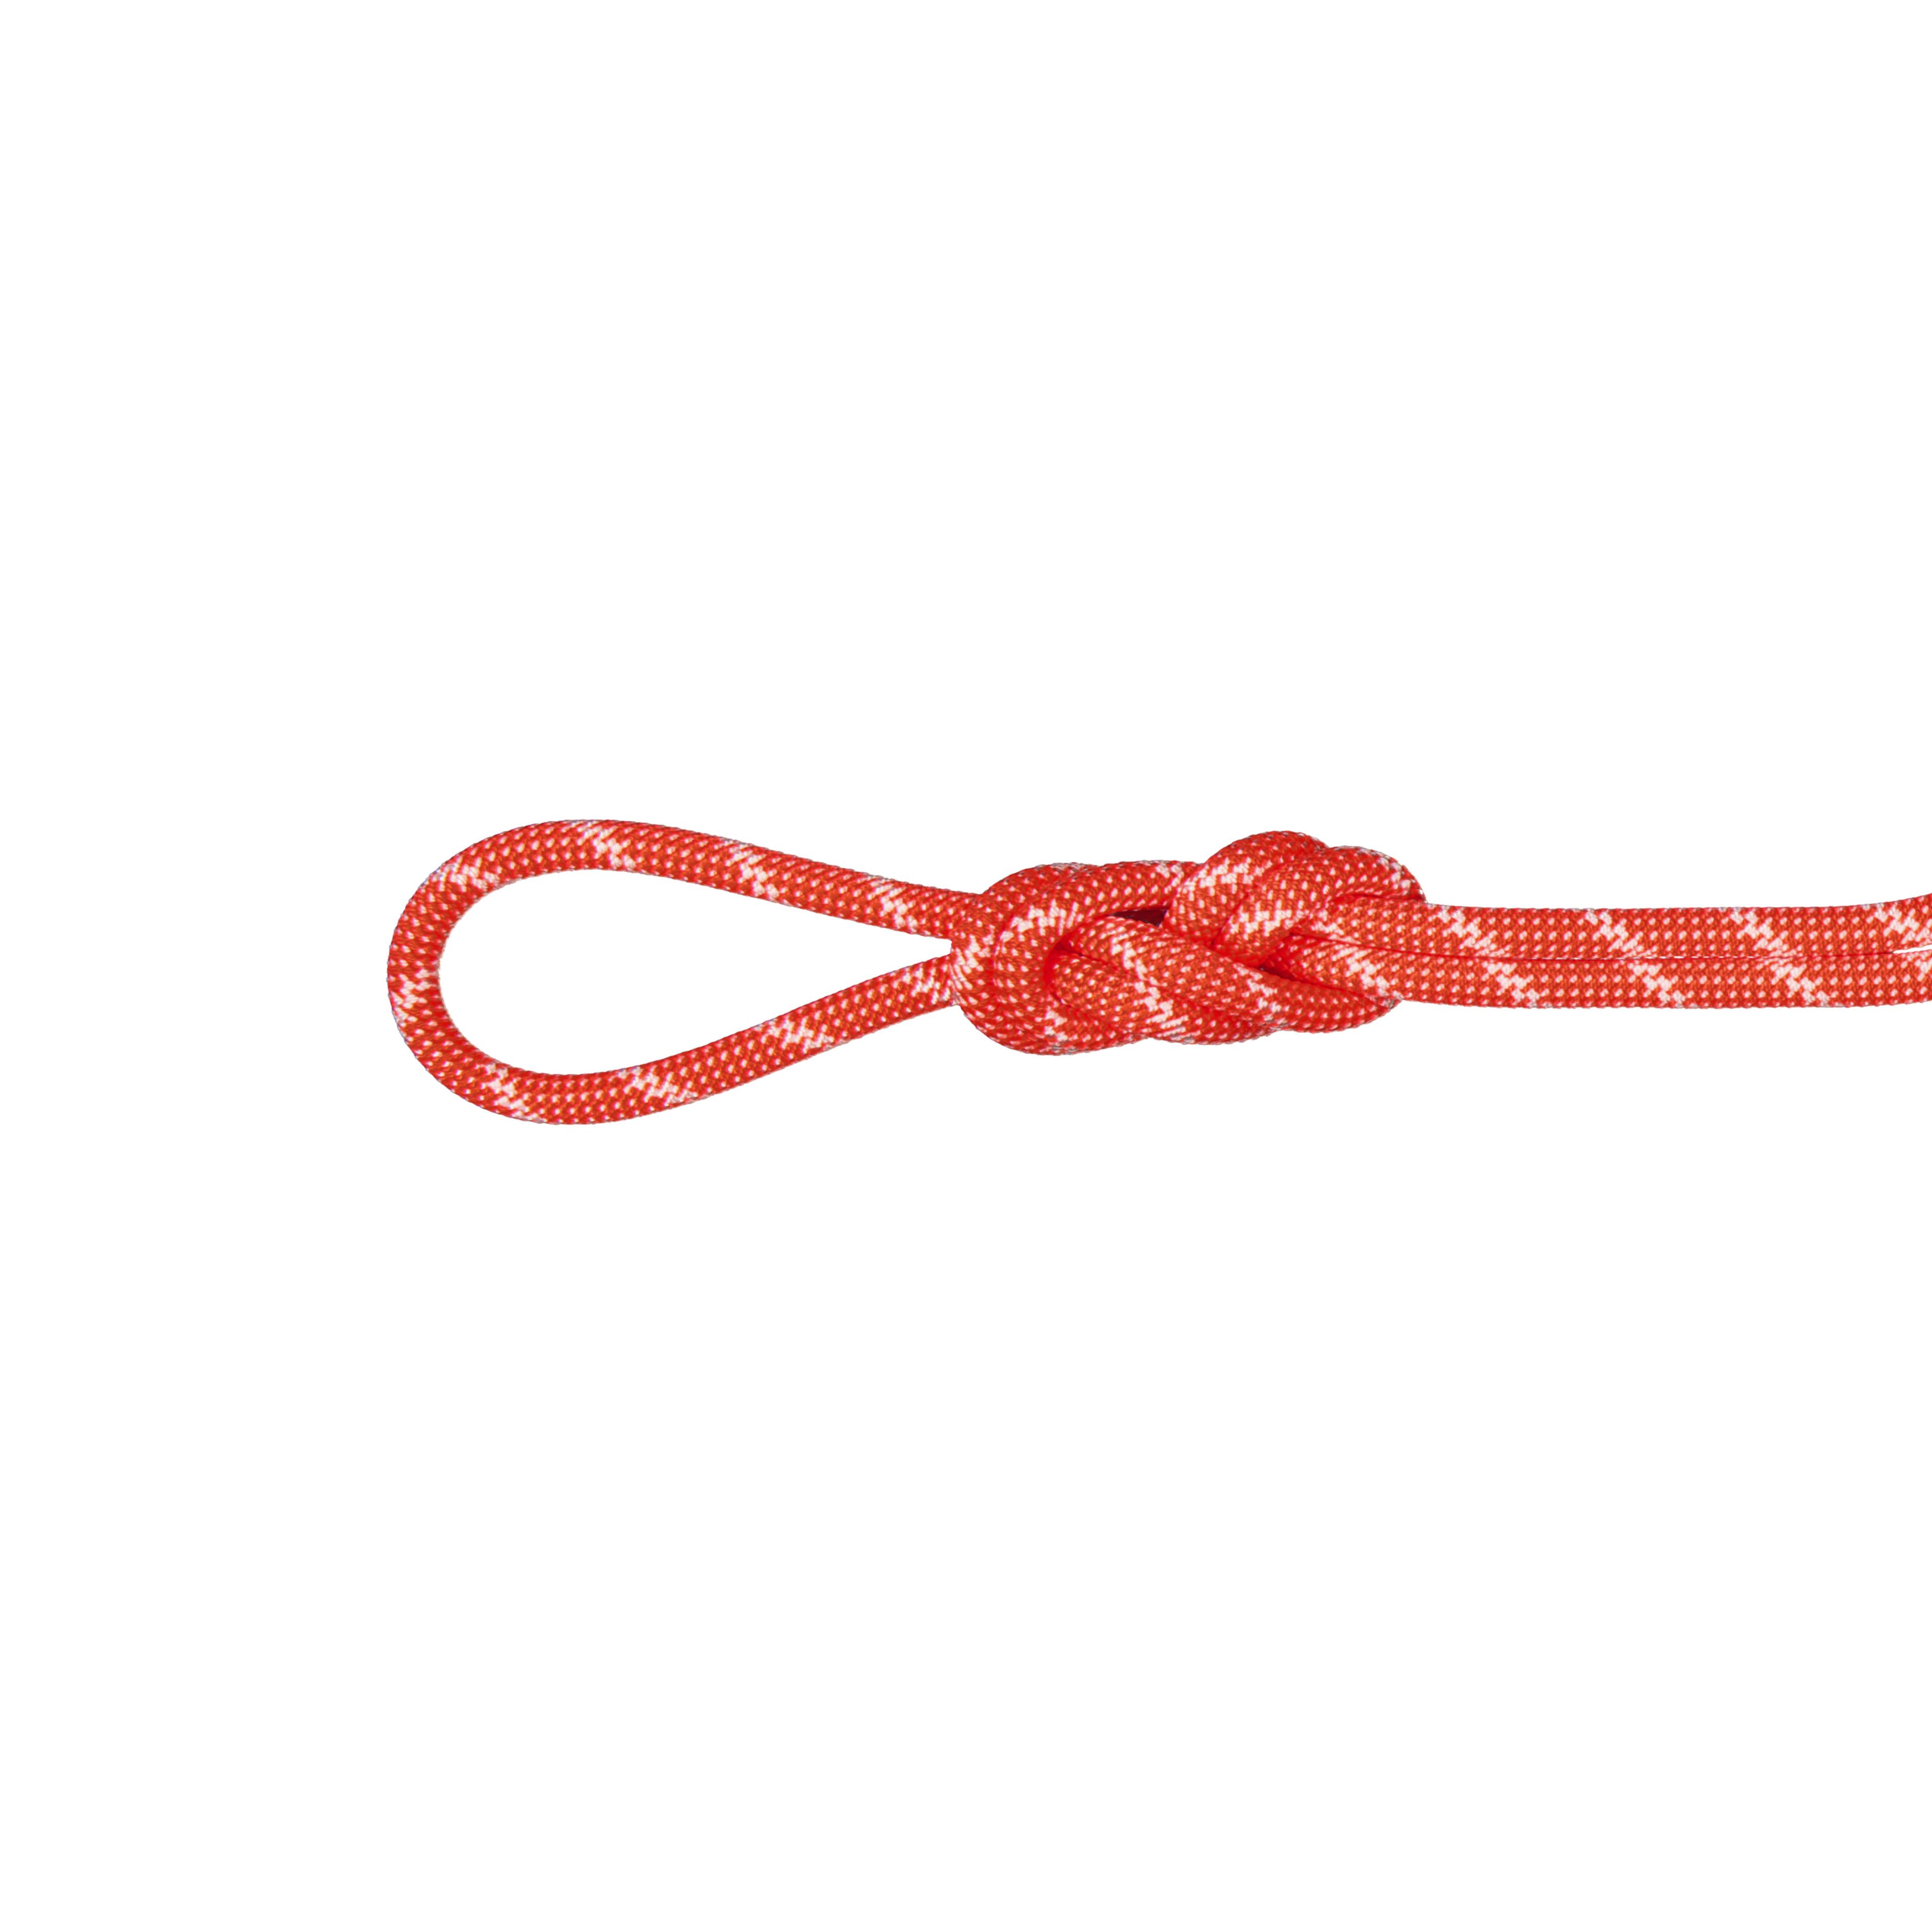 8.0 Alpine Classic Rope - 60 m, Classic Standard, orange-white thumbnail